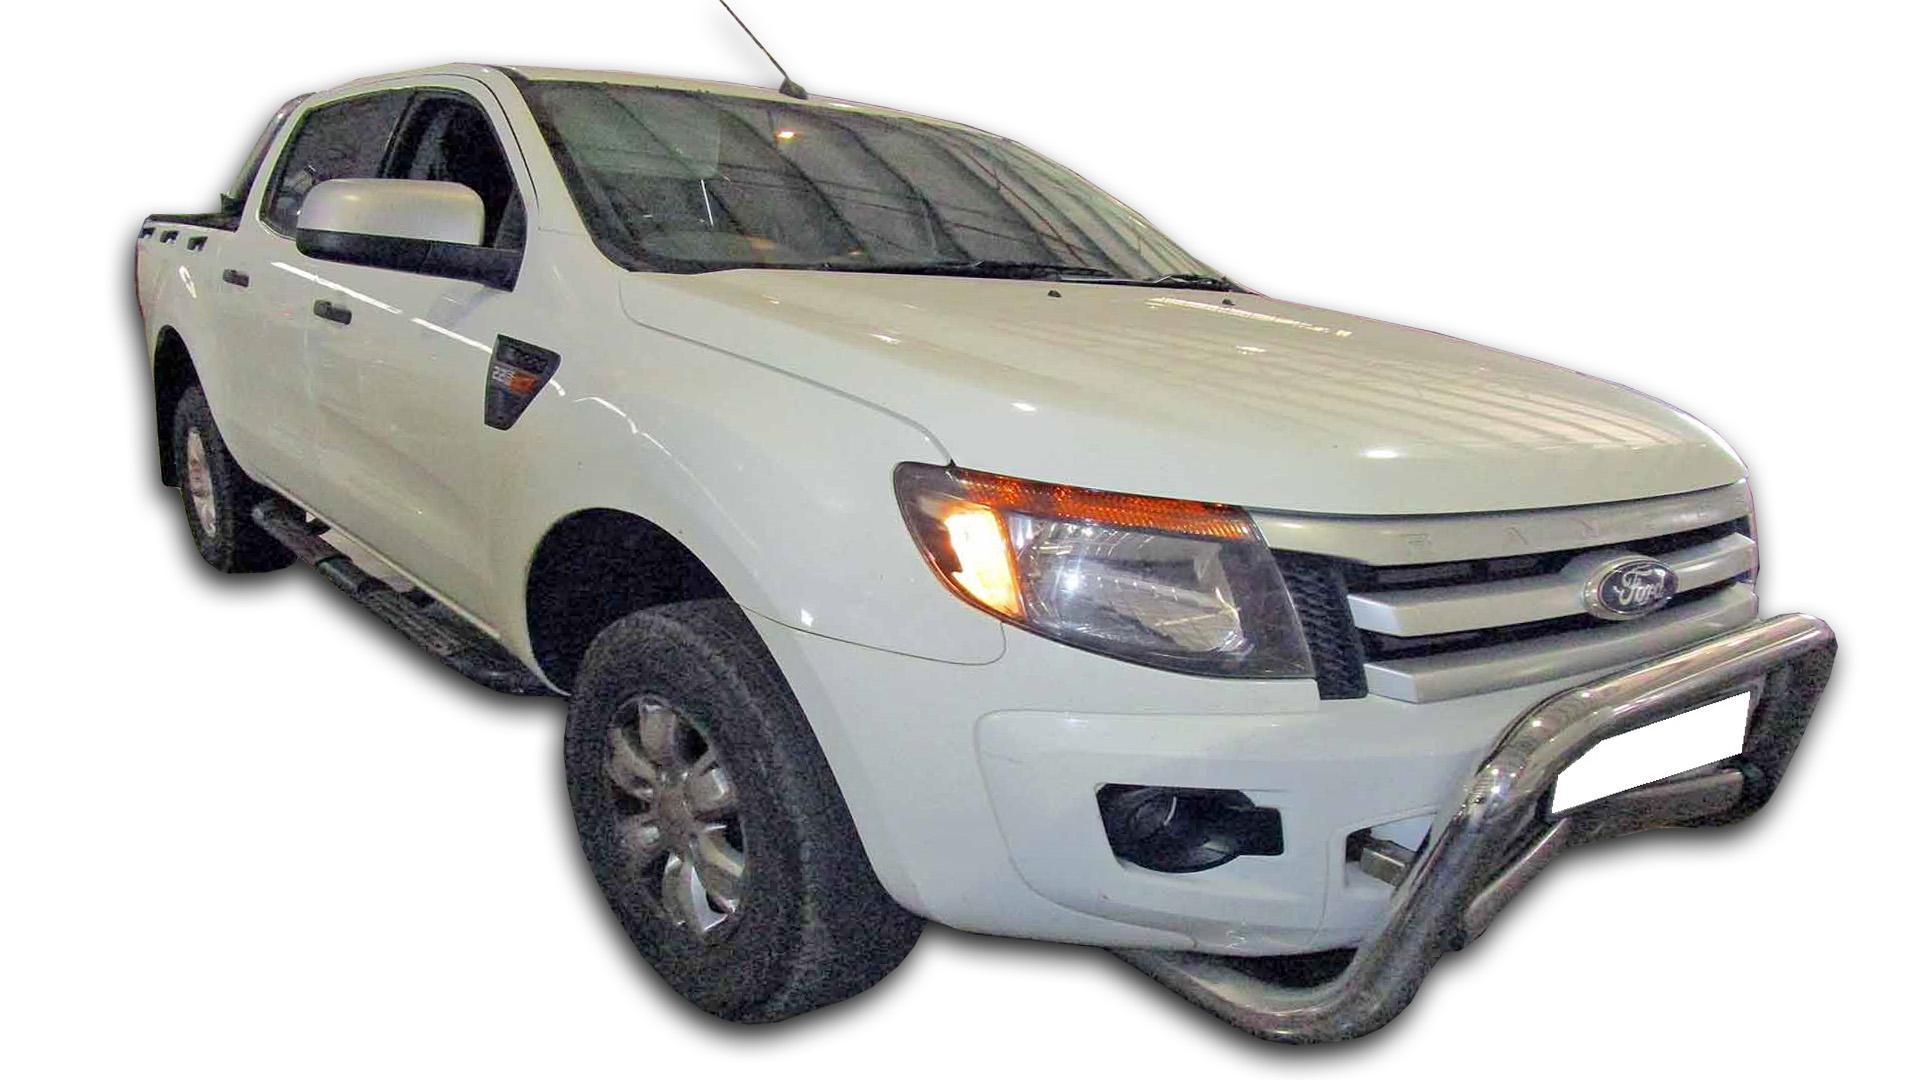 Ford Ranger 2.2 Tdci XLS D/CAB